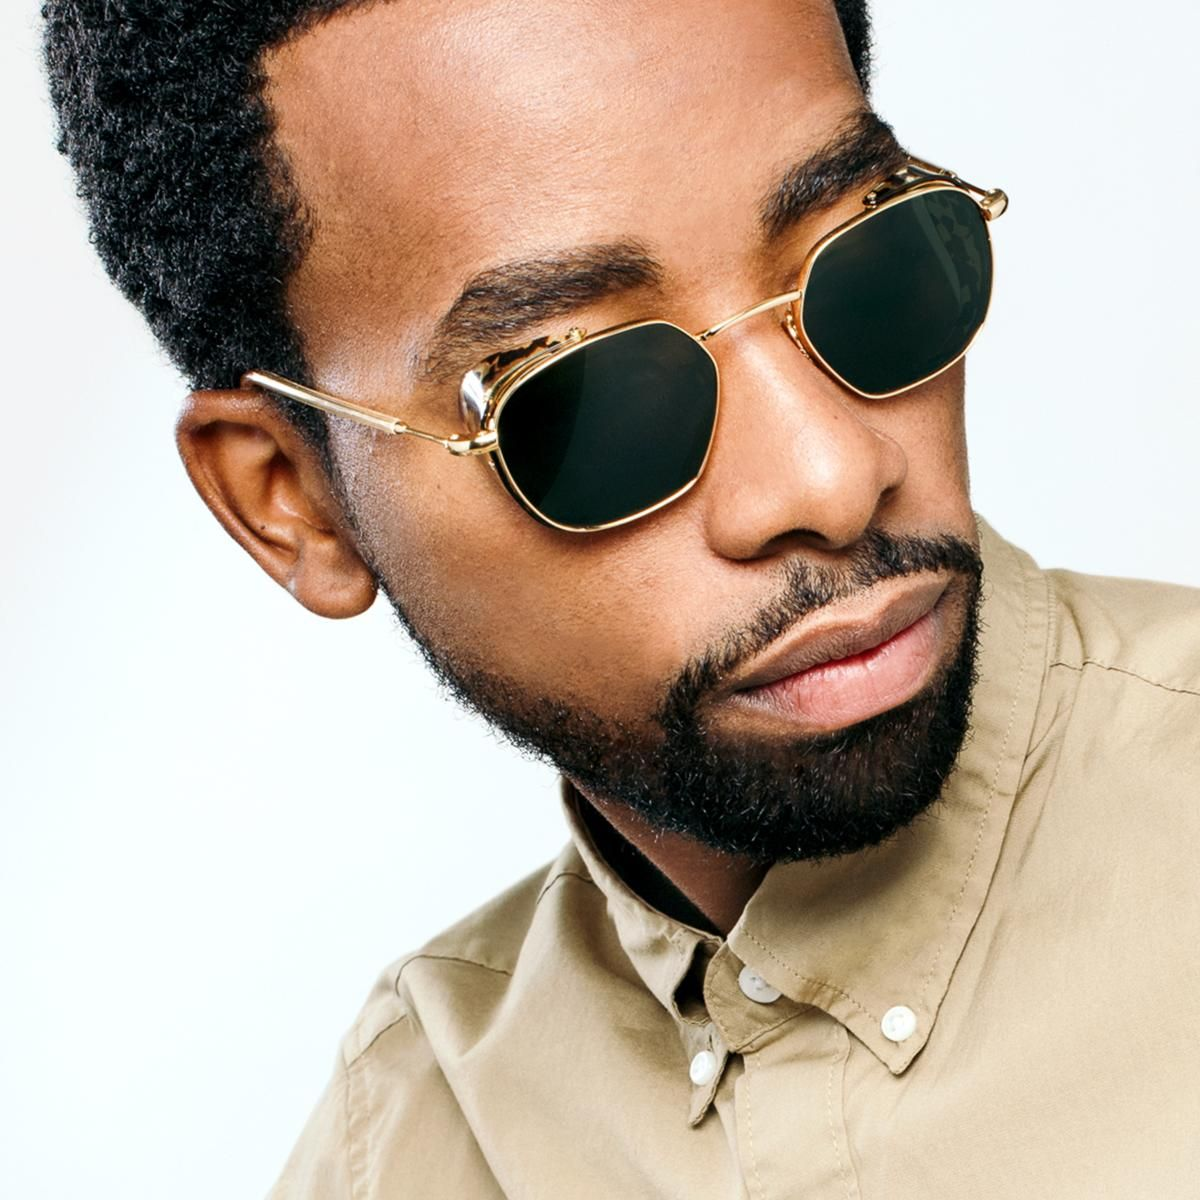 WARD BLINKER 24K Titanium + Zulu Best mens sunglasses